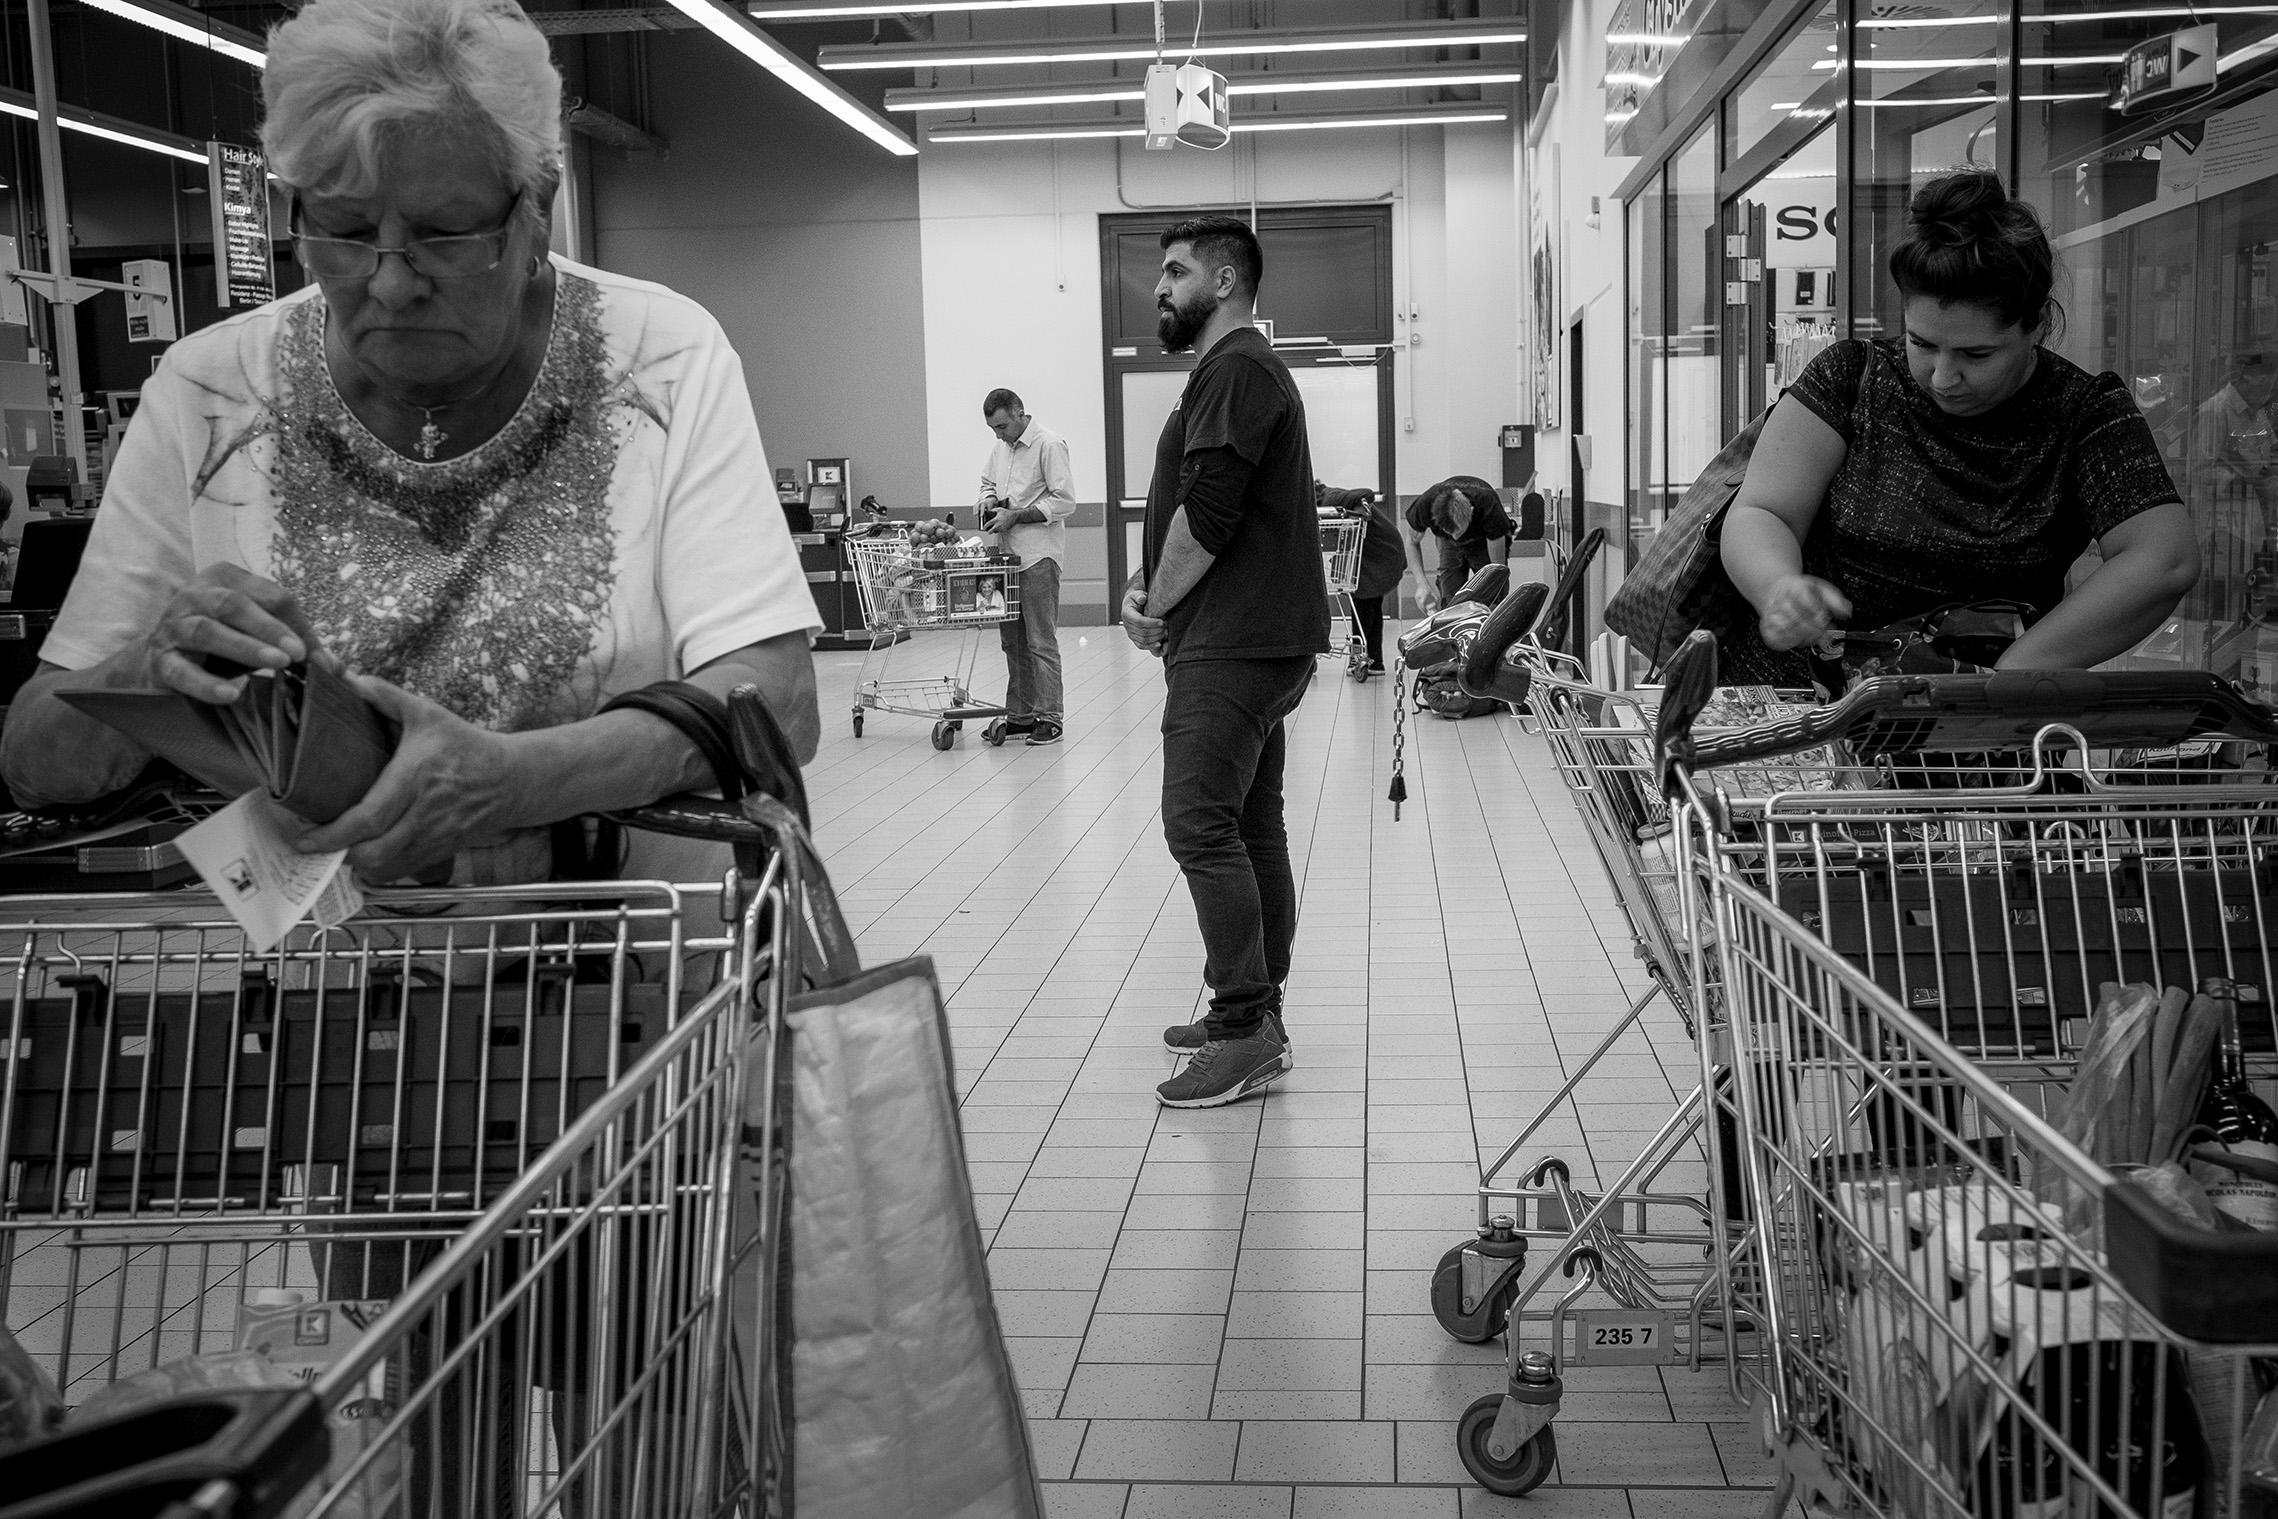 fluechtlinge-syrien-berlin-asyl-integration-arbeit